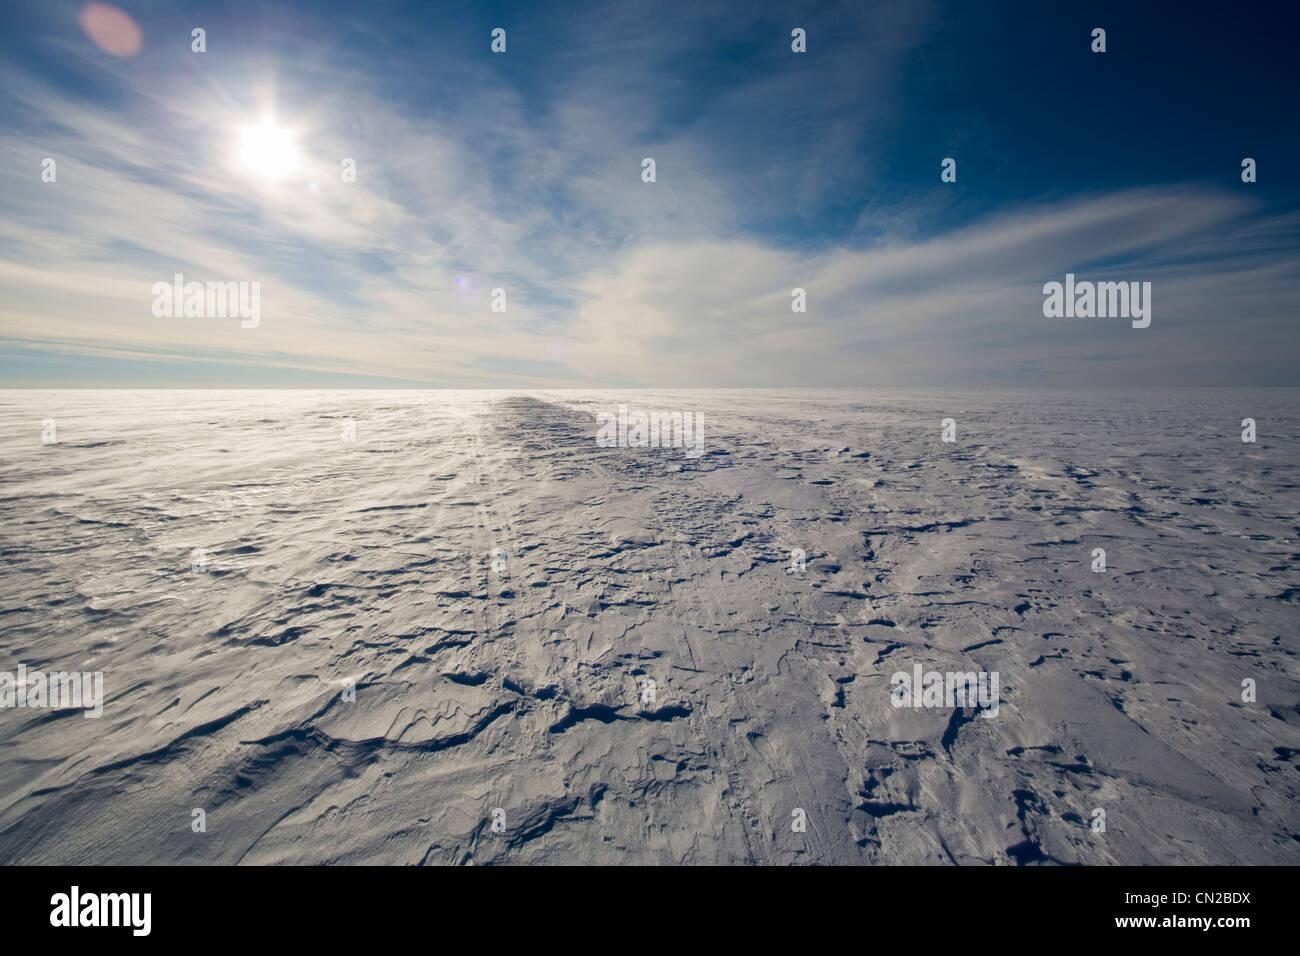 La tundra Polar paisaje ártico - Capa de hielo de Groenlandia Imagen De Stock